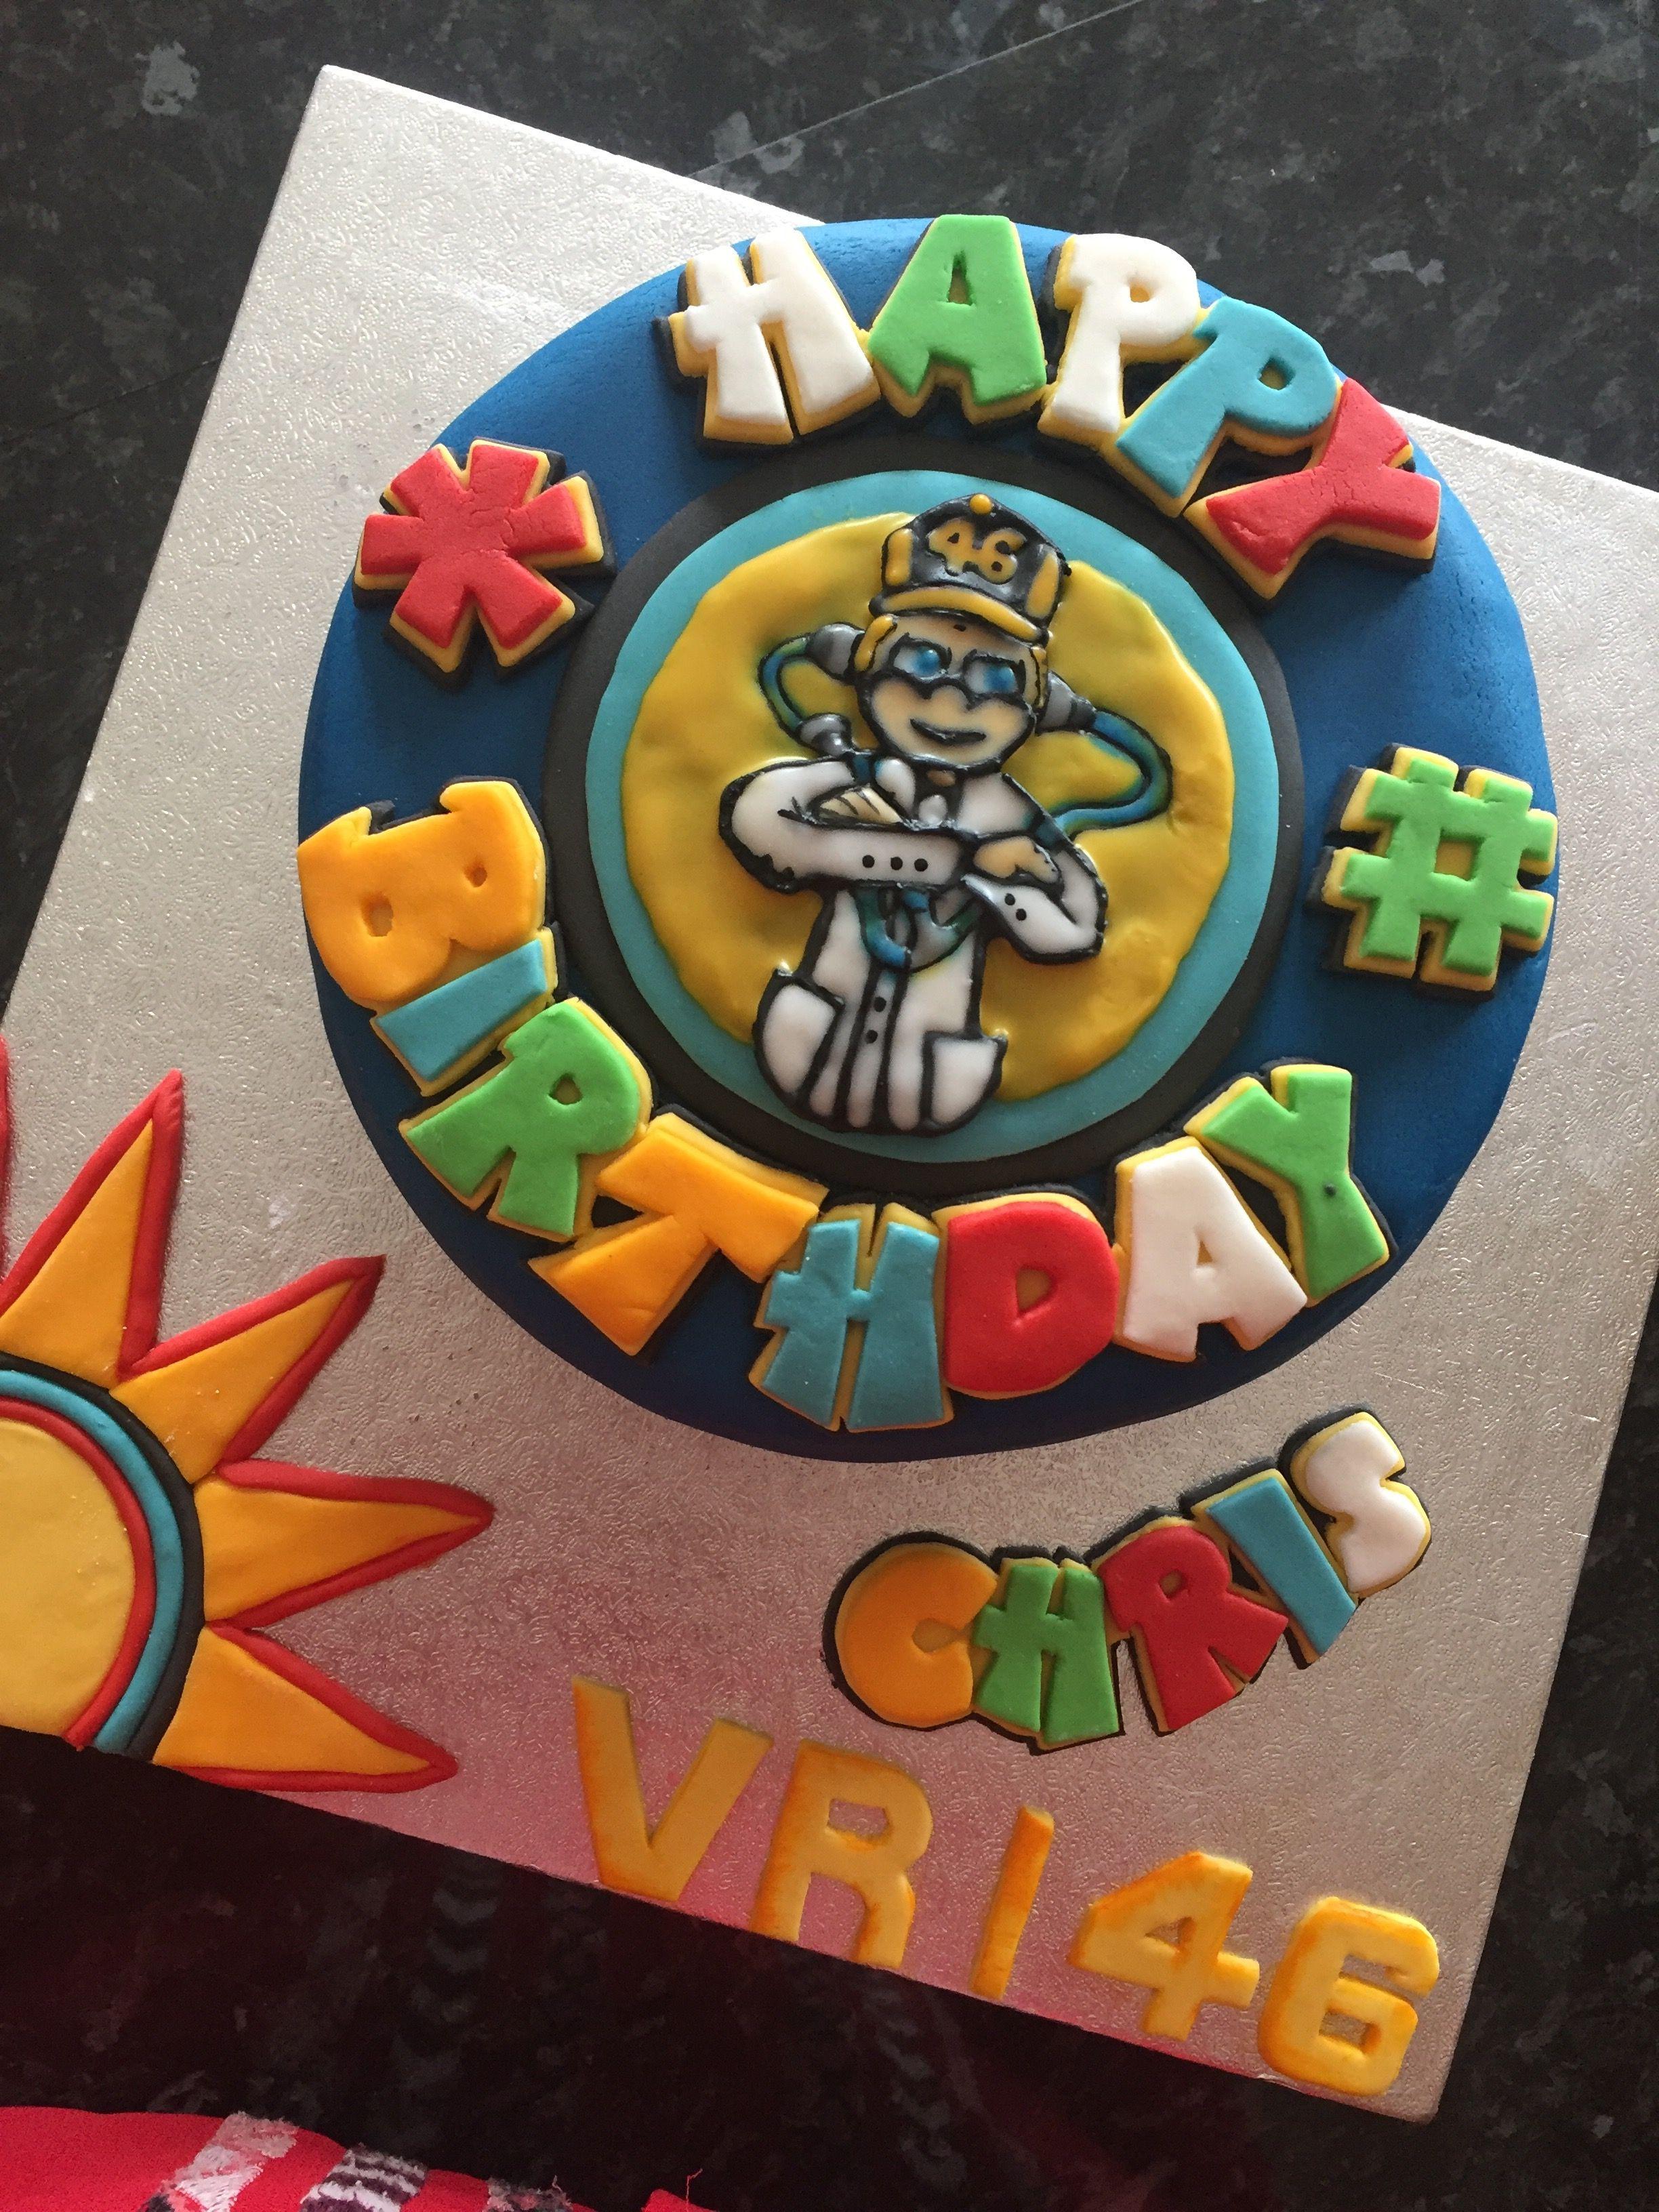 maxresdefaultjpg 1280 720 Cumplea os de VR46 – Valentino Rossi Birthday Card